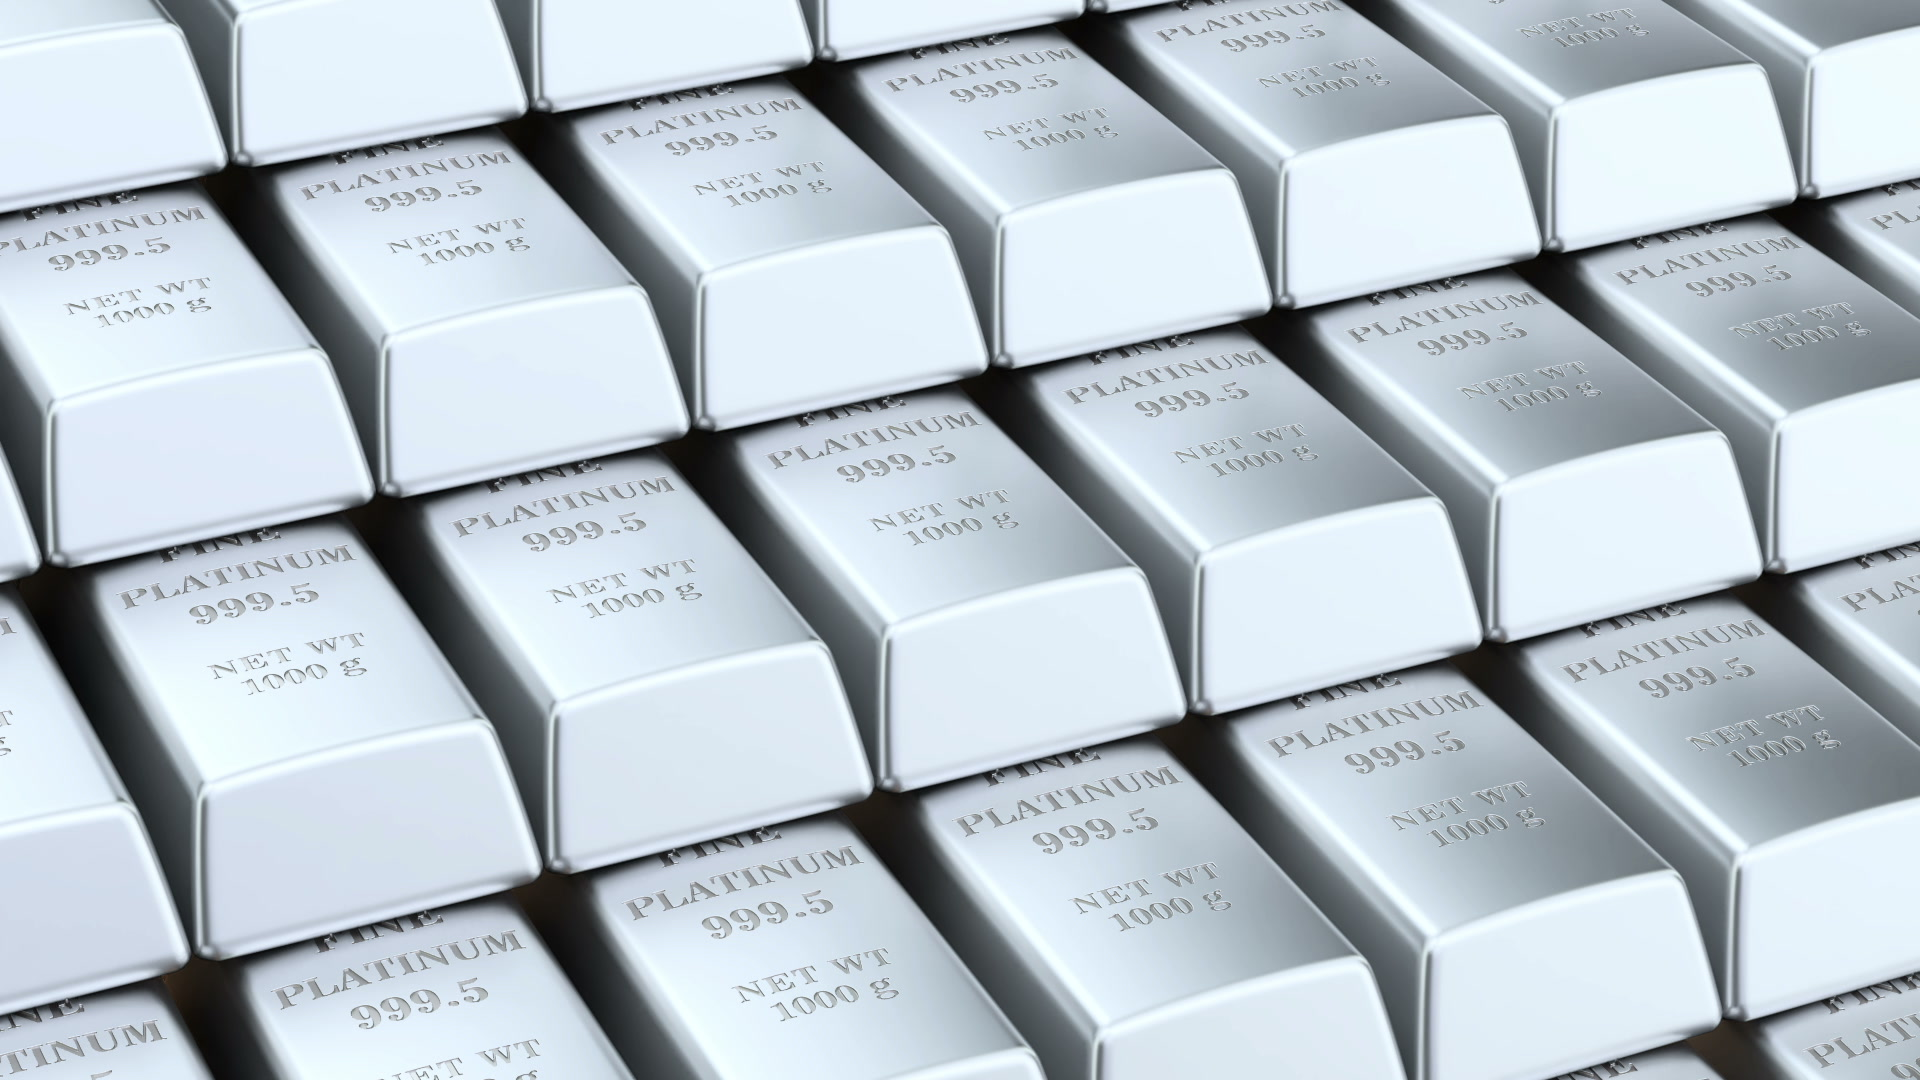 Platinum Wave Analysis – 30 September, 2019